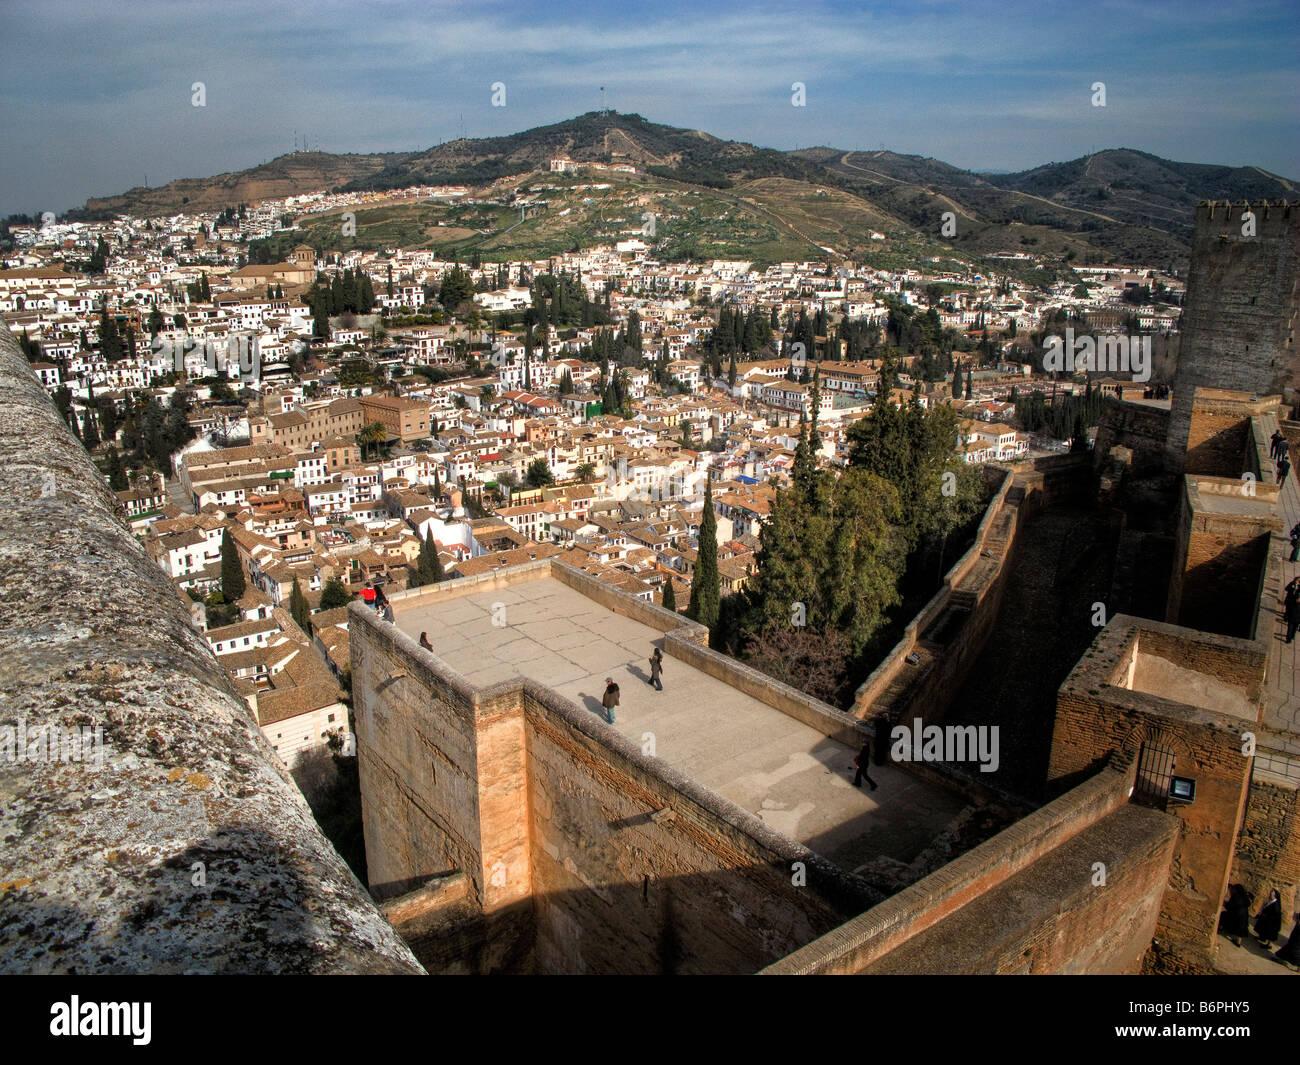 The Albaycin, The Moorish quarter in Granada, Andalucia, Spain from